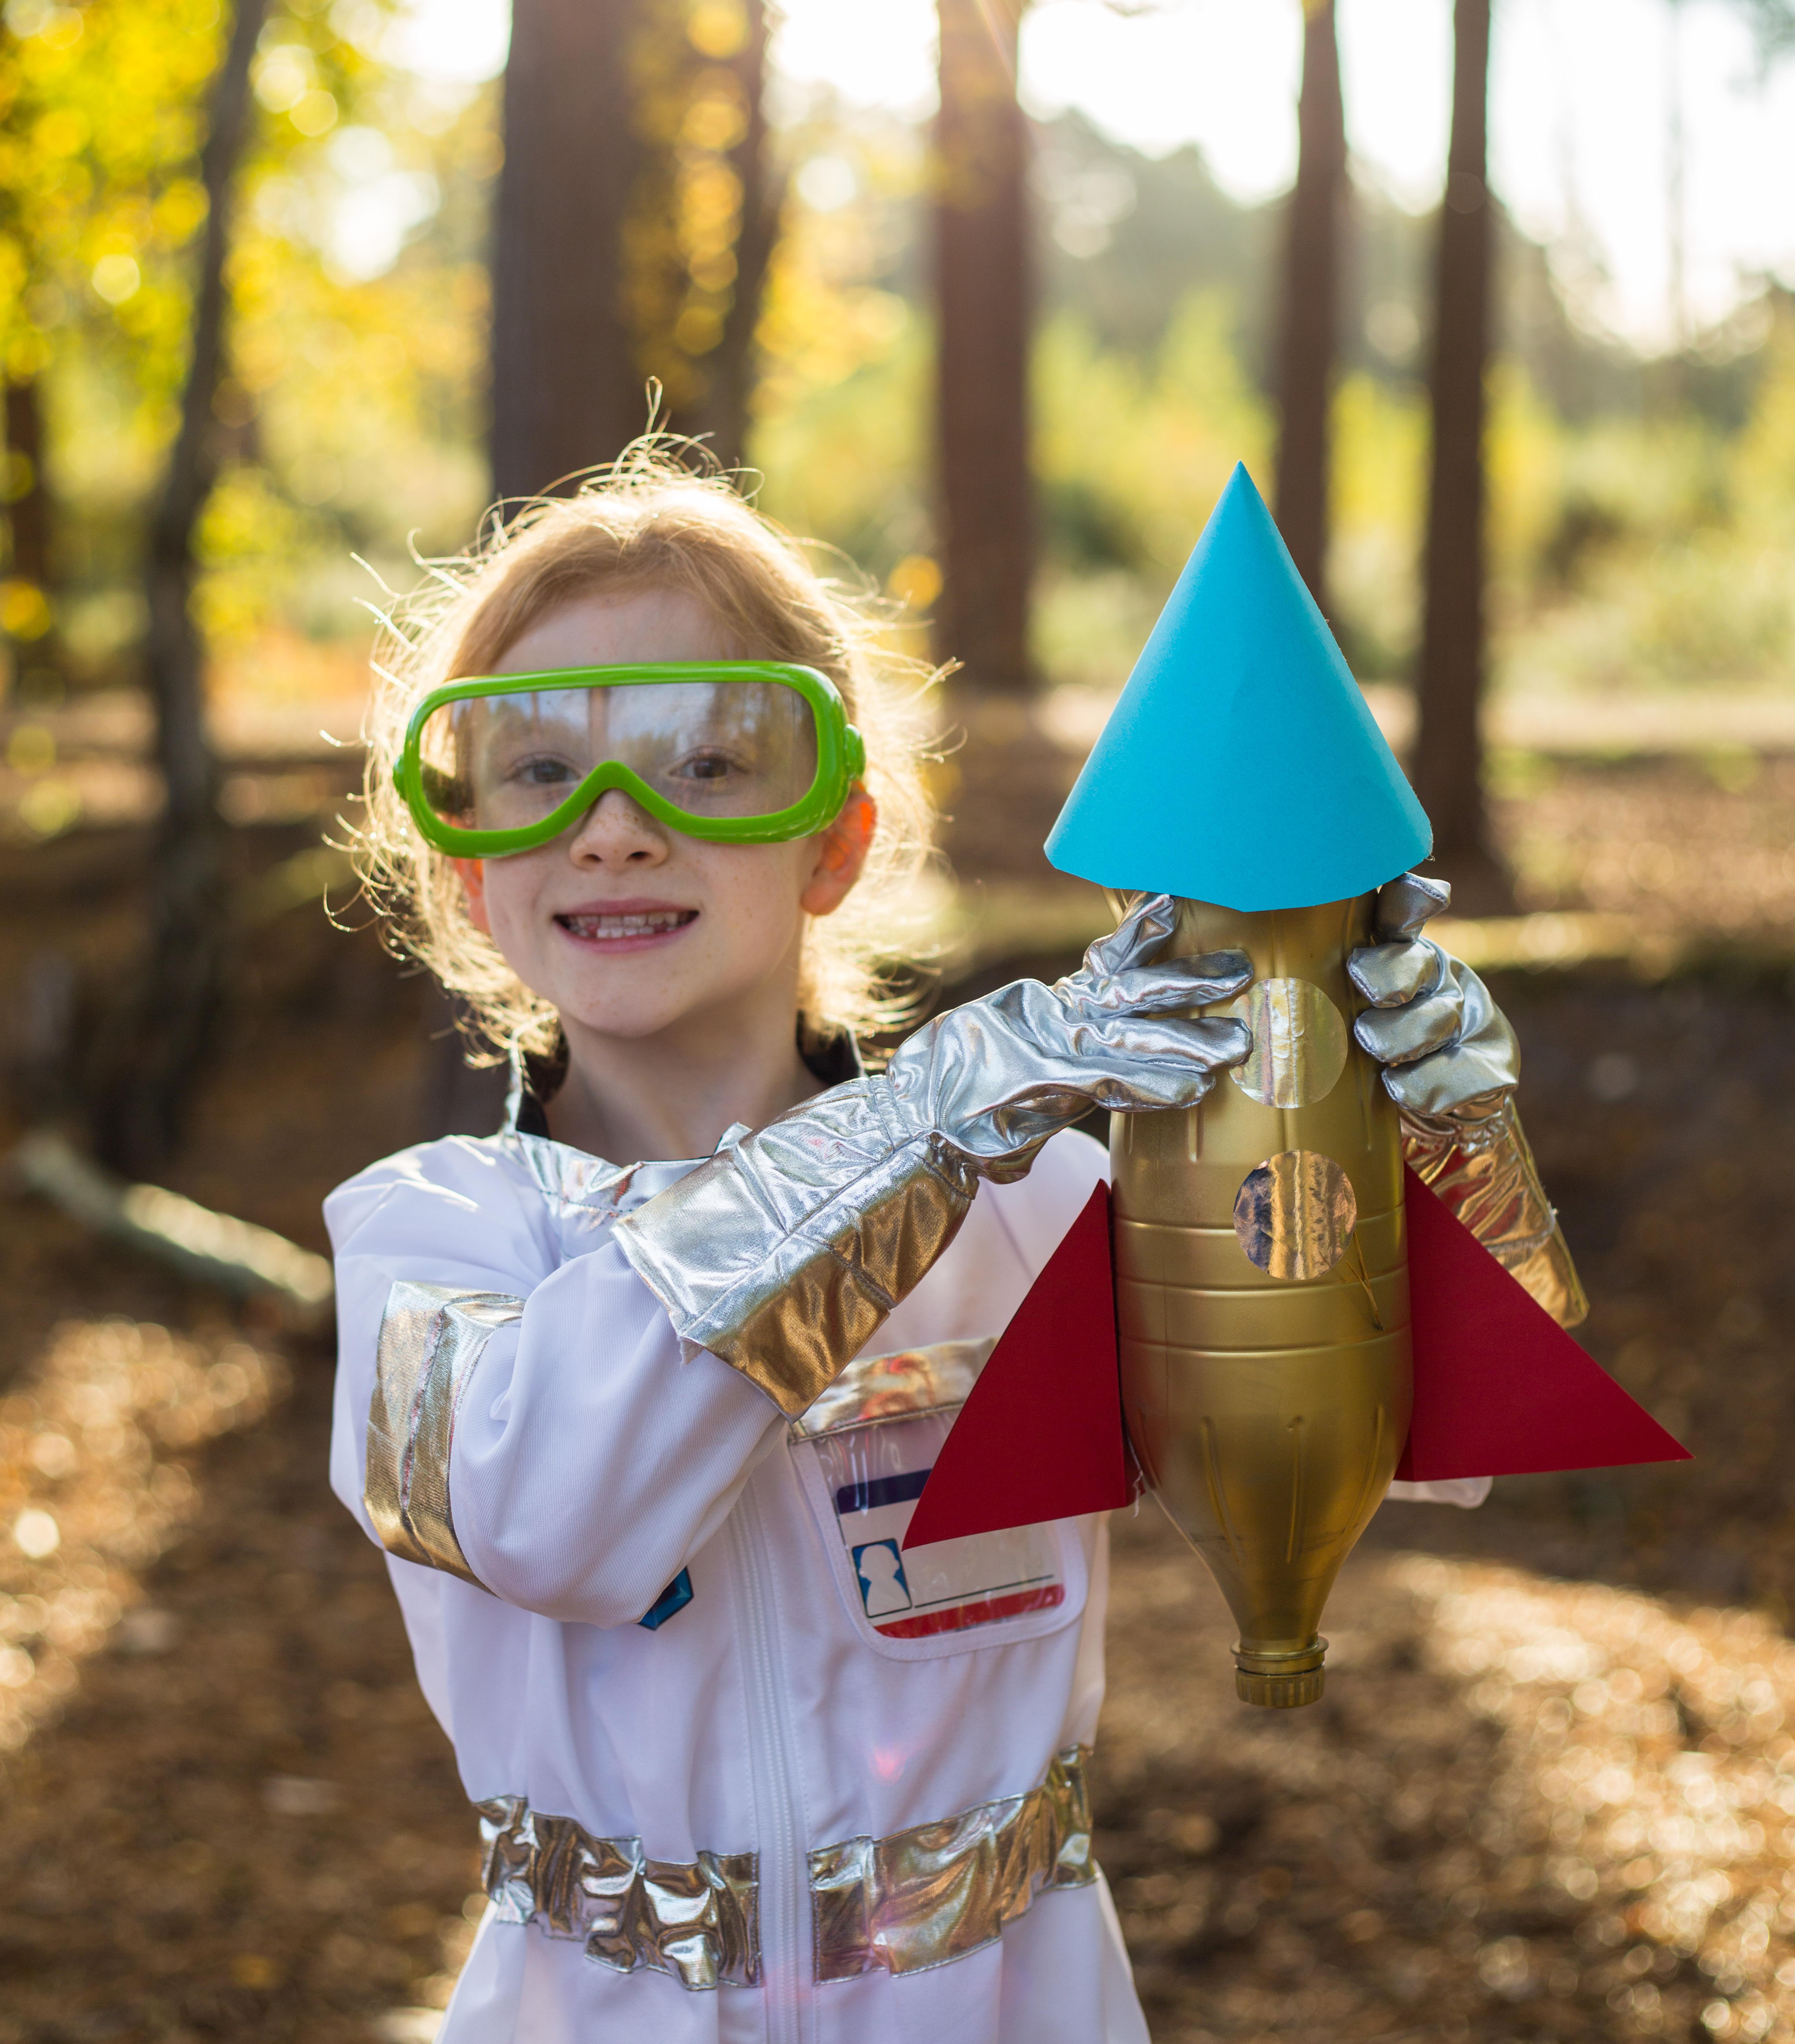 How to make a Bottle Rocket – Science Sparks